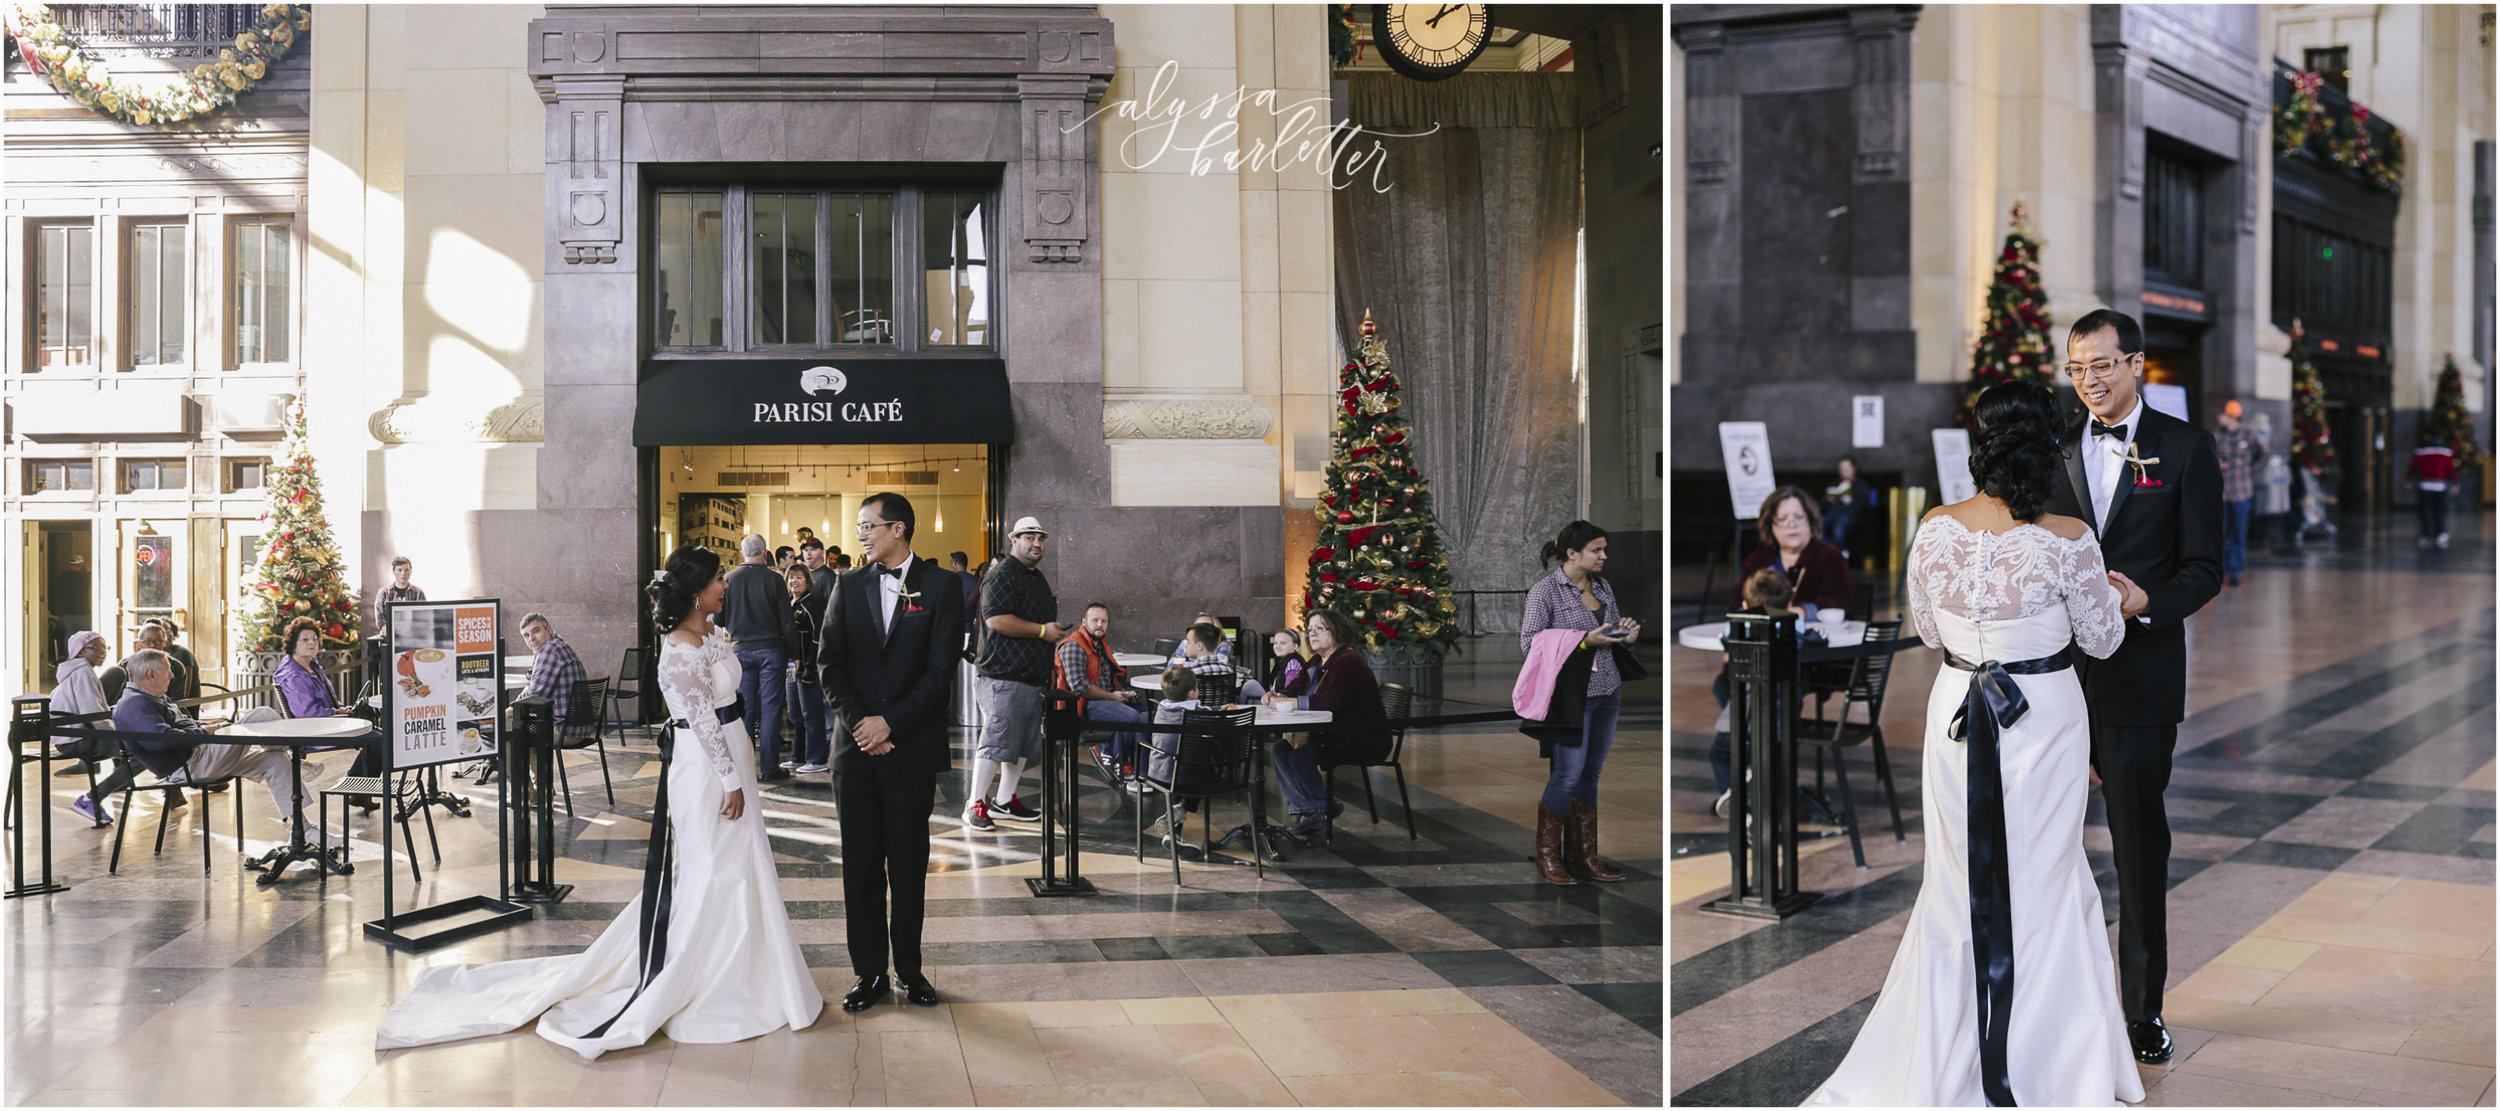 alyssa barletter photography union station wedding photos leopard print winter wedding-1-18.jpg